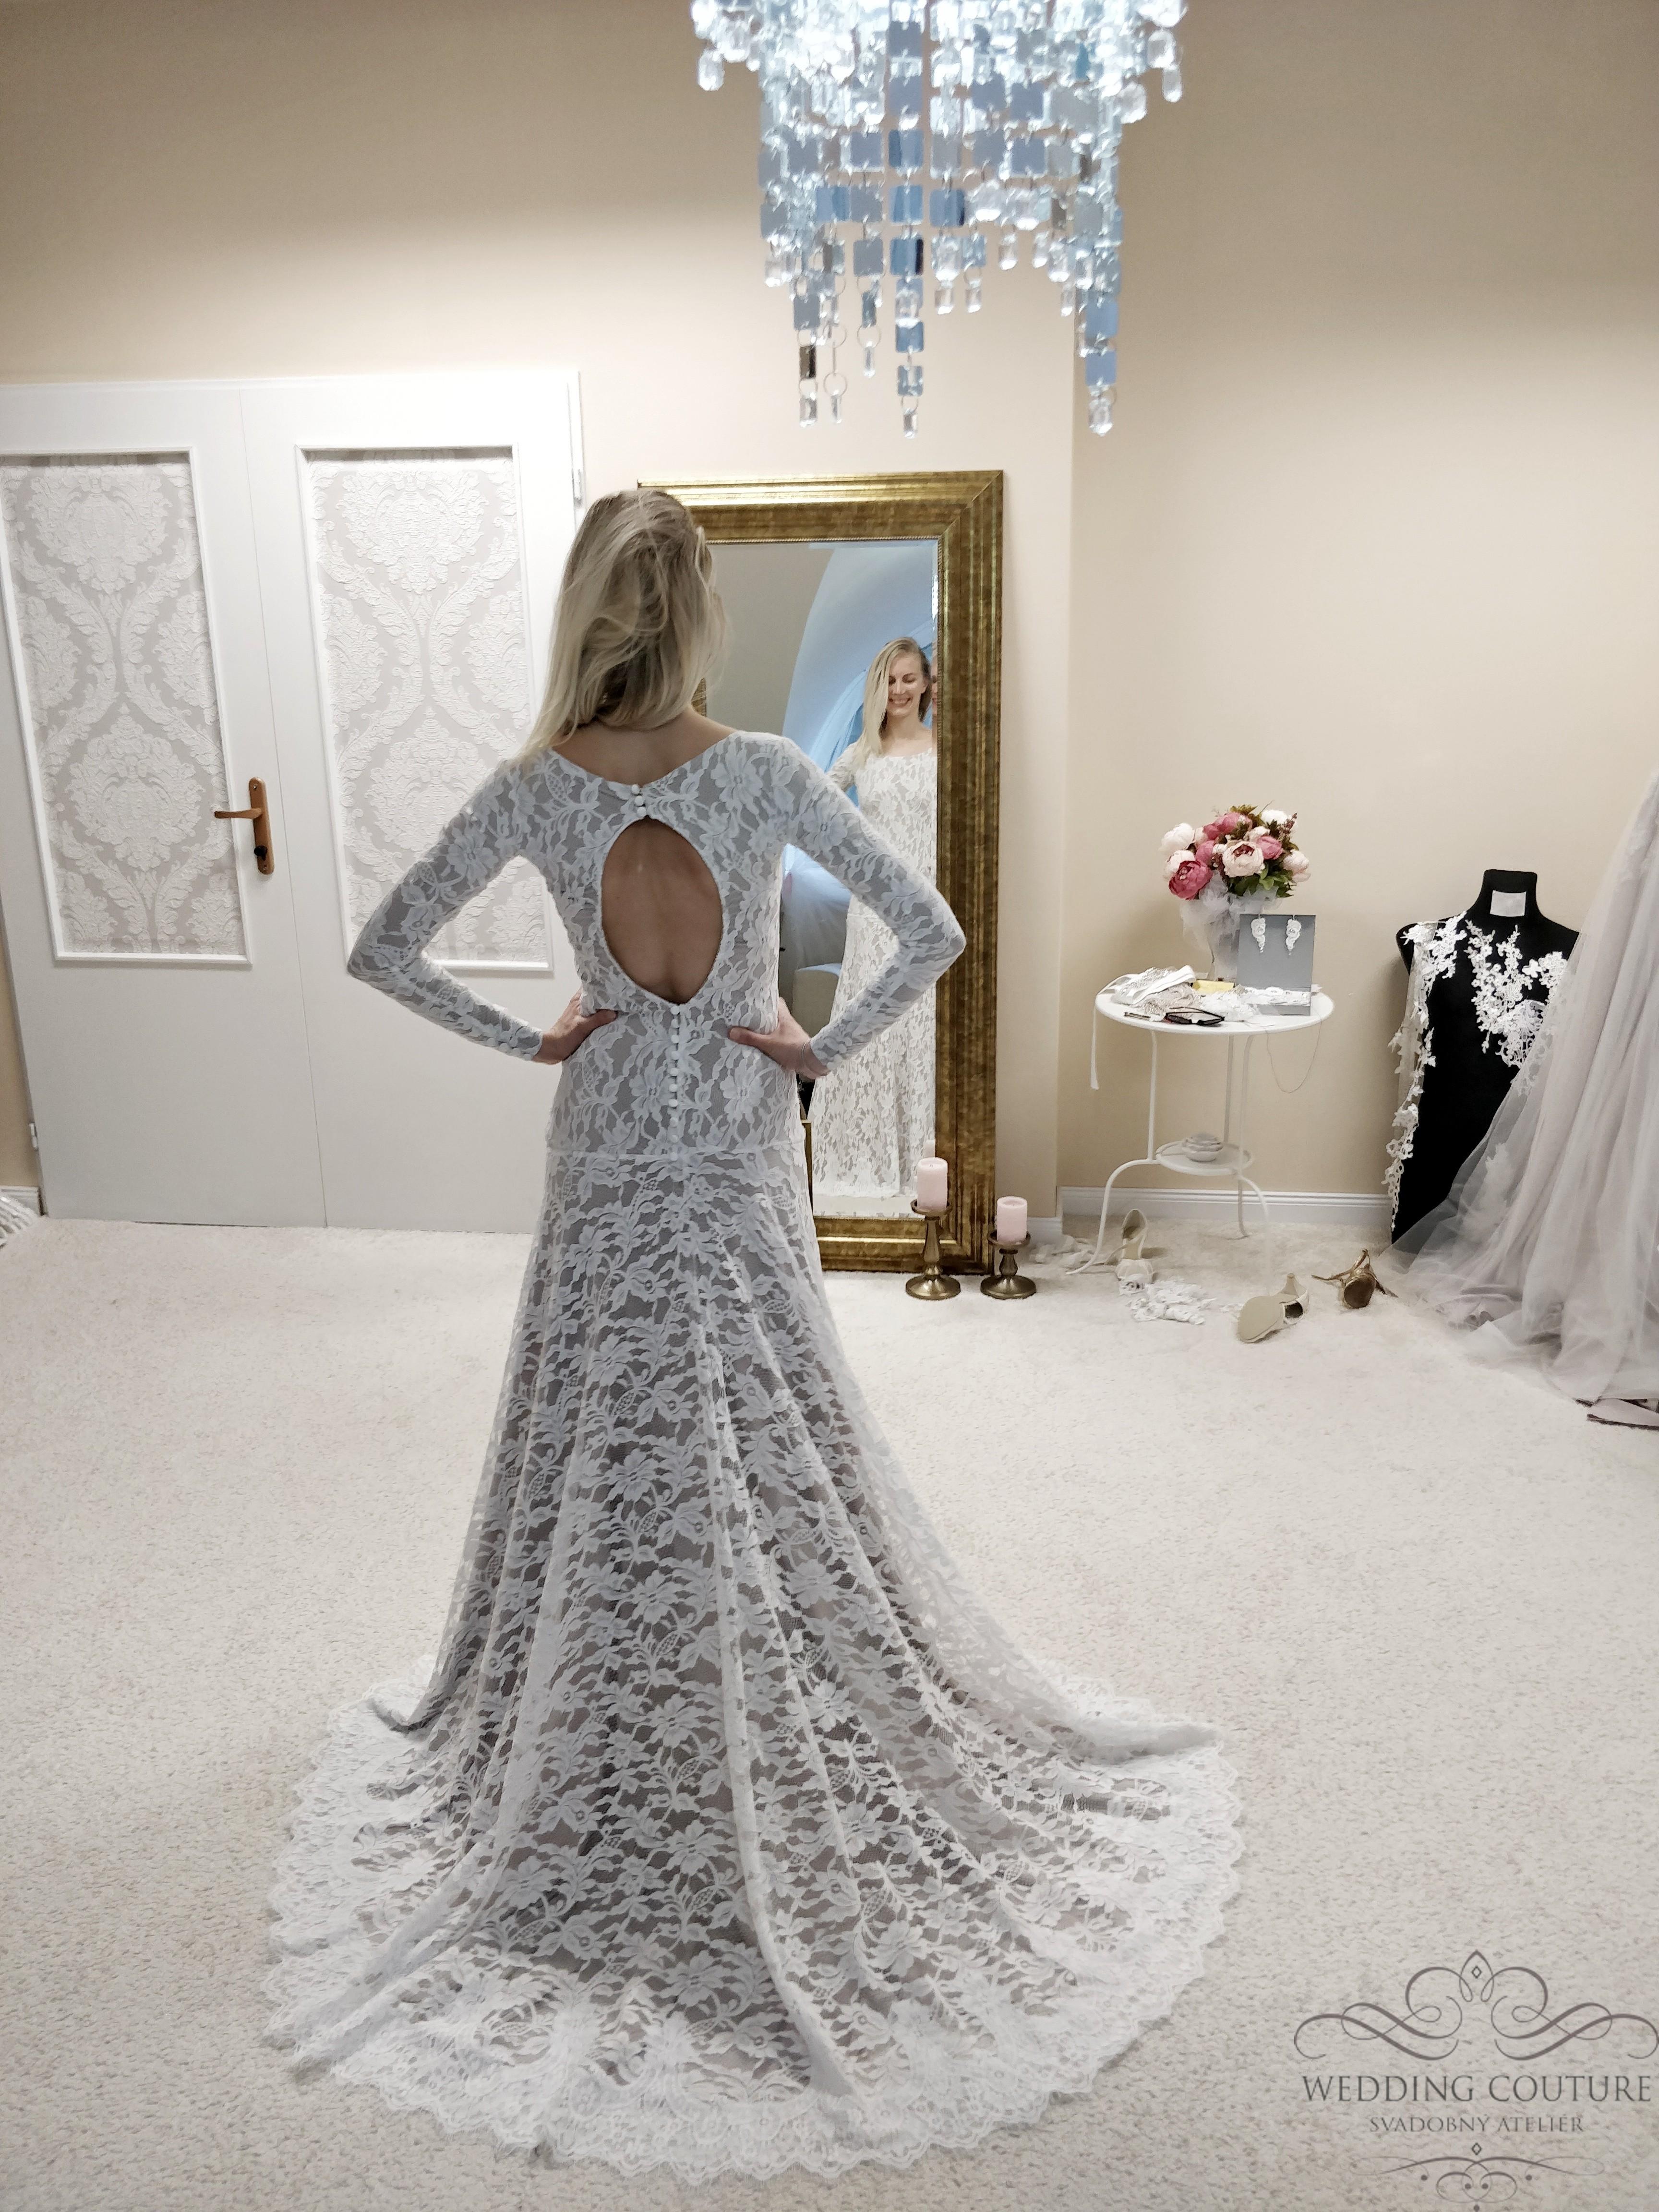 dc686b20128e Príbehy Wedding Couture neviest